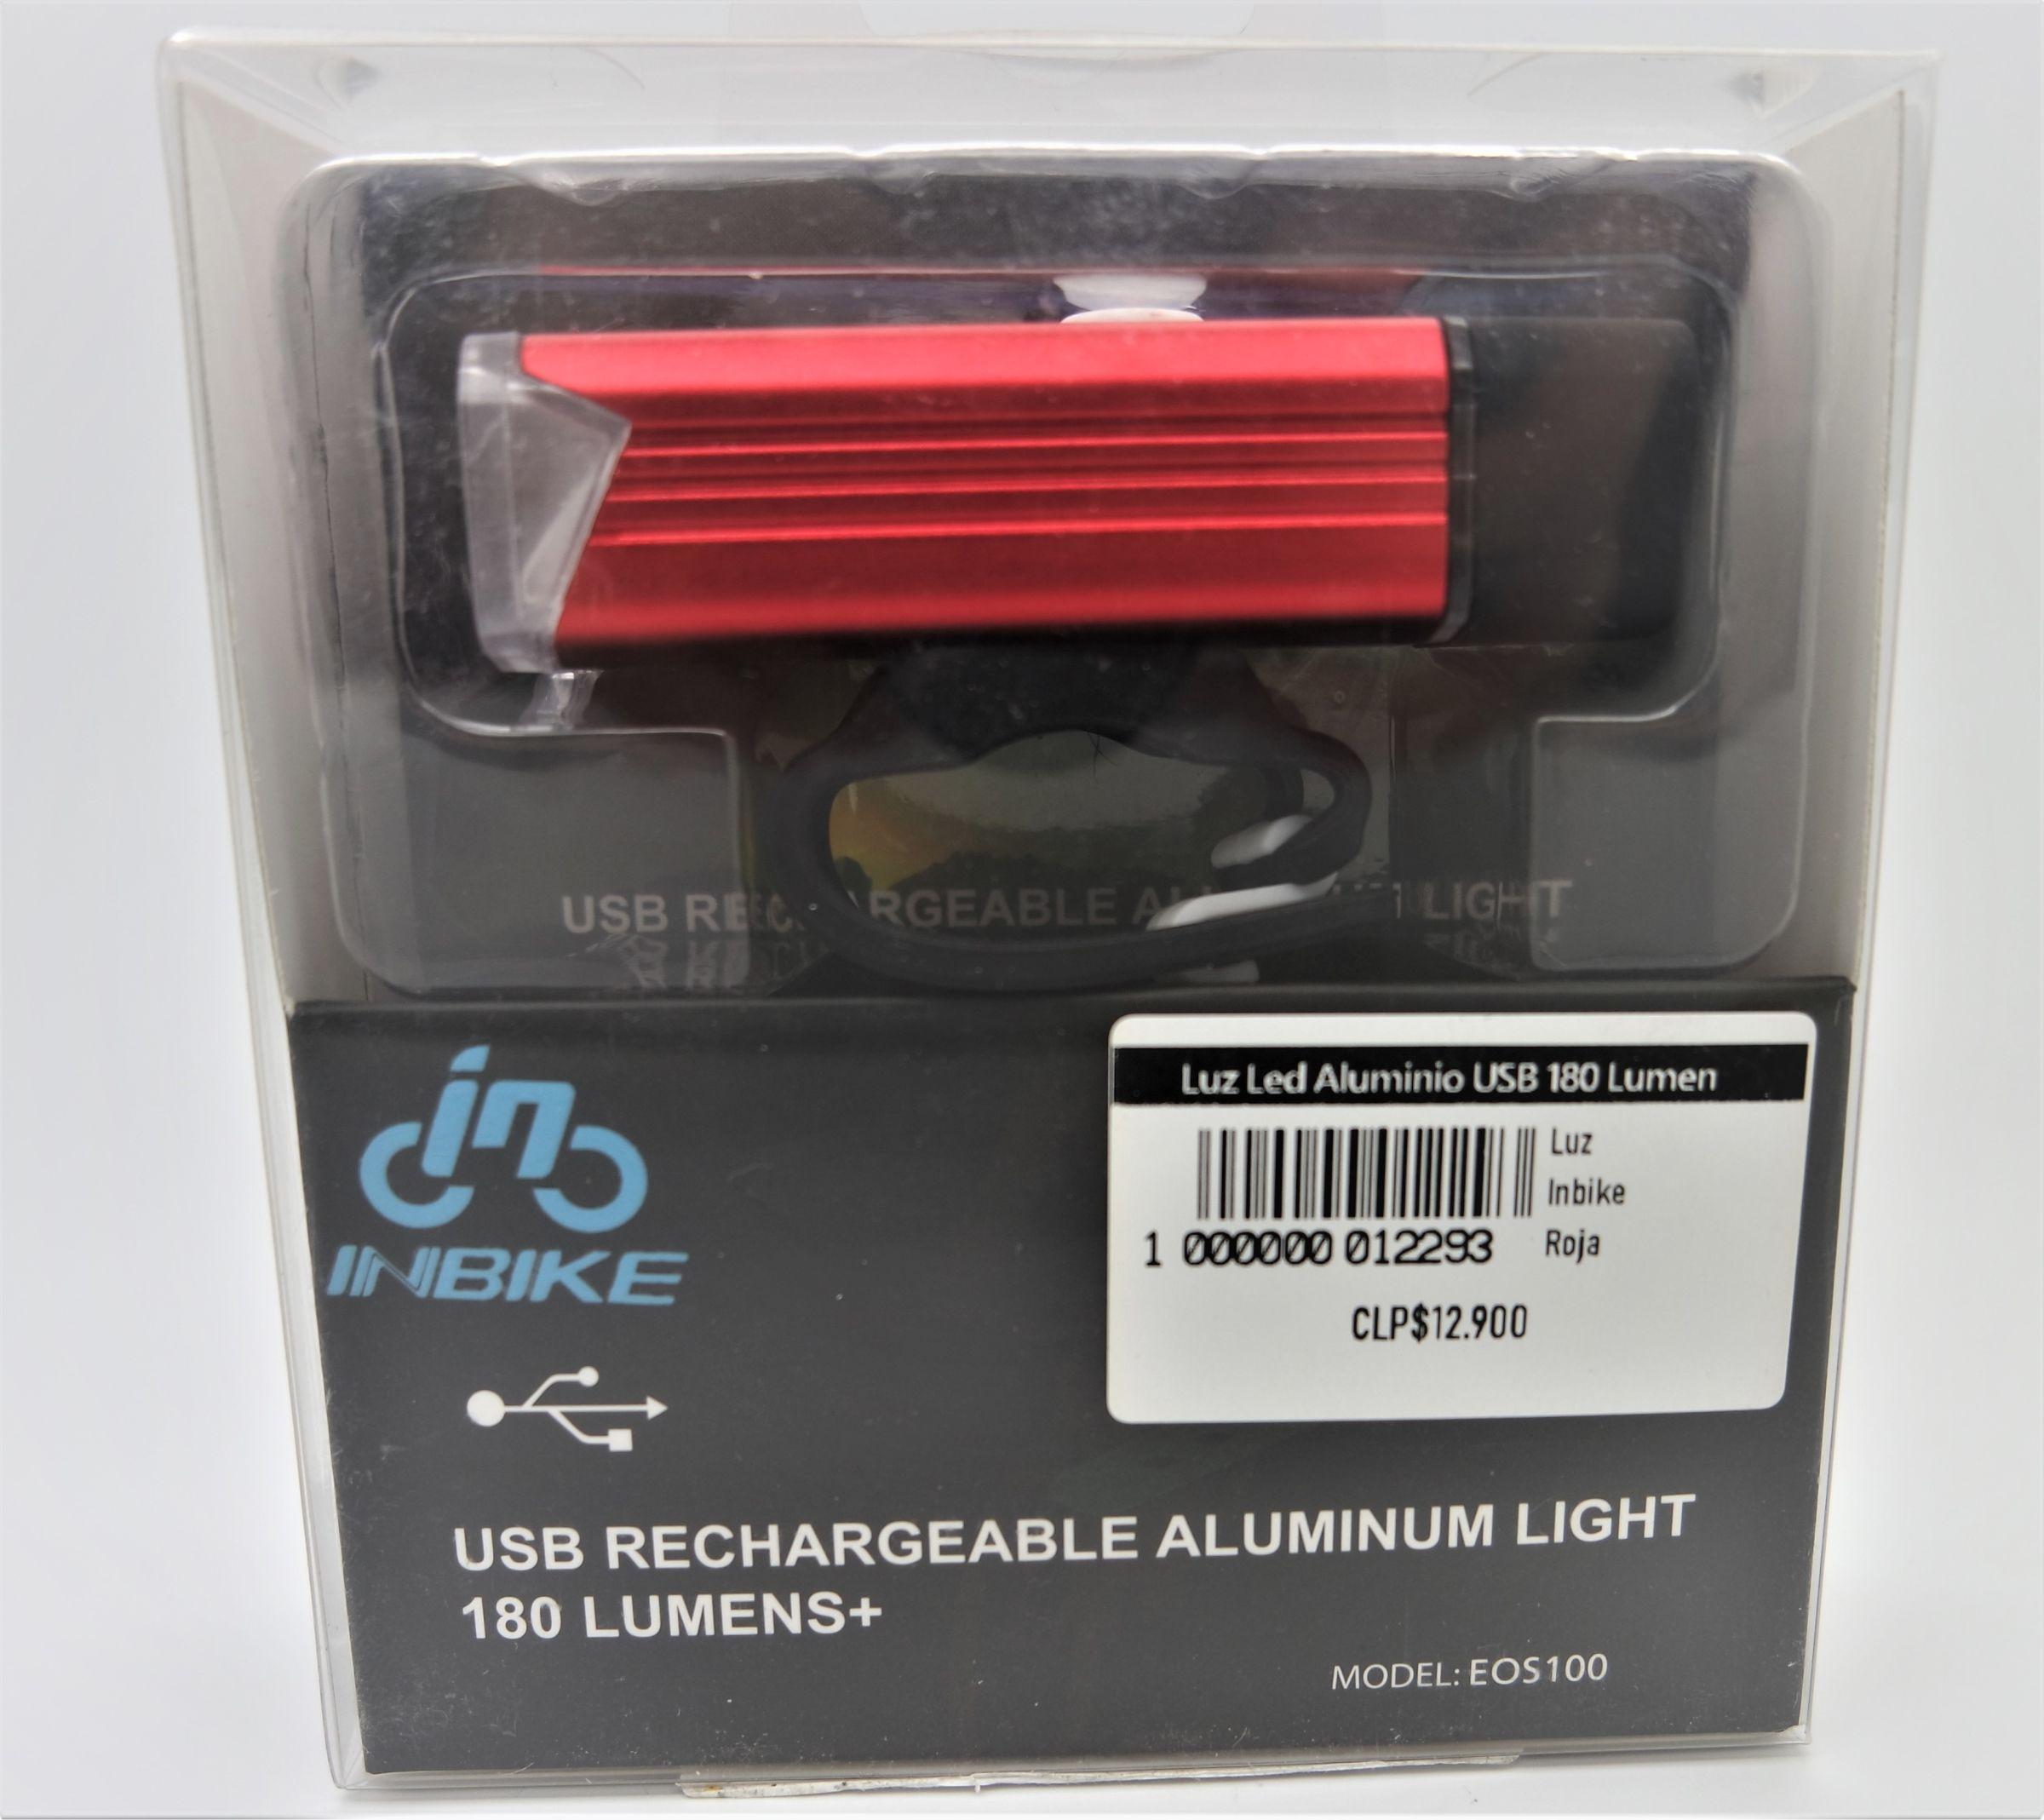 Luz Led Aluminio USB 180 Lumen